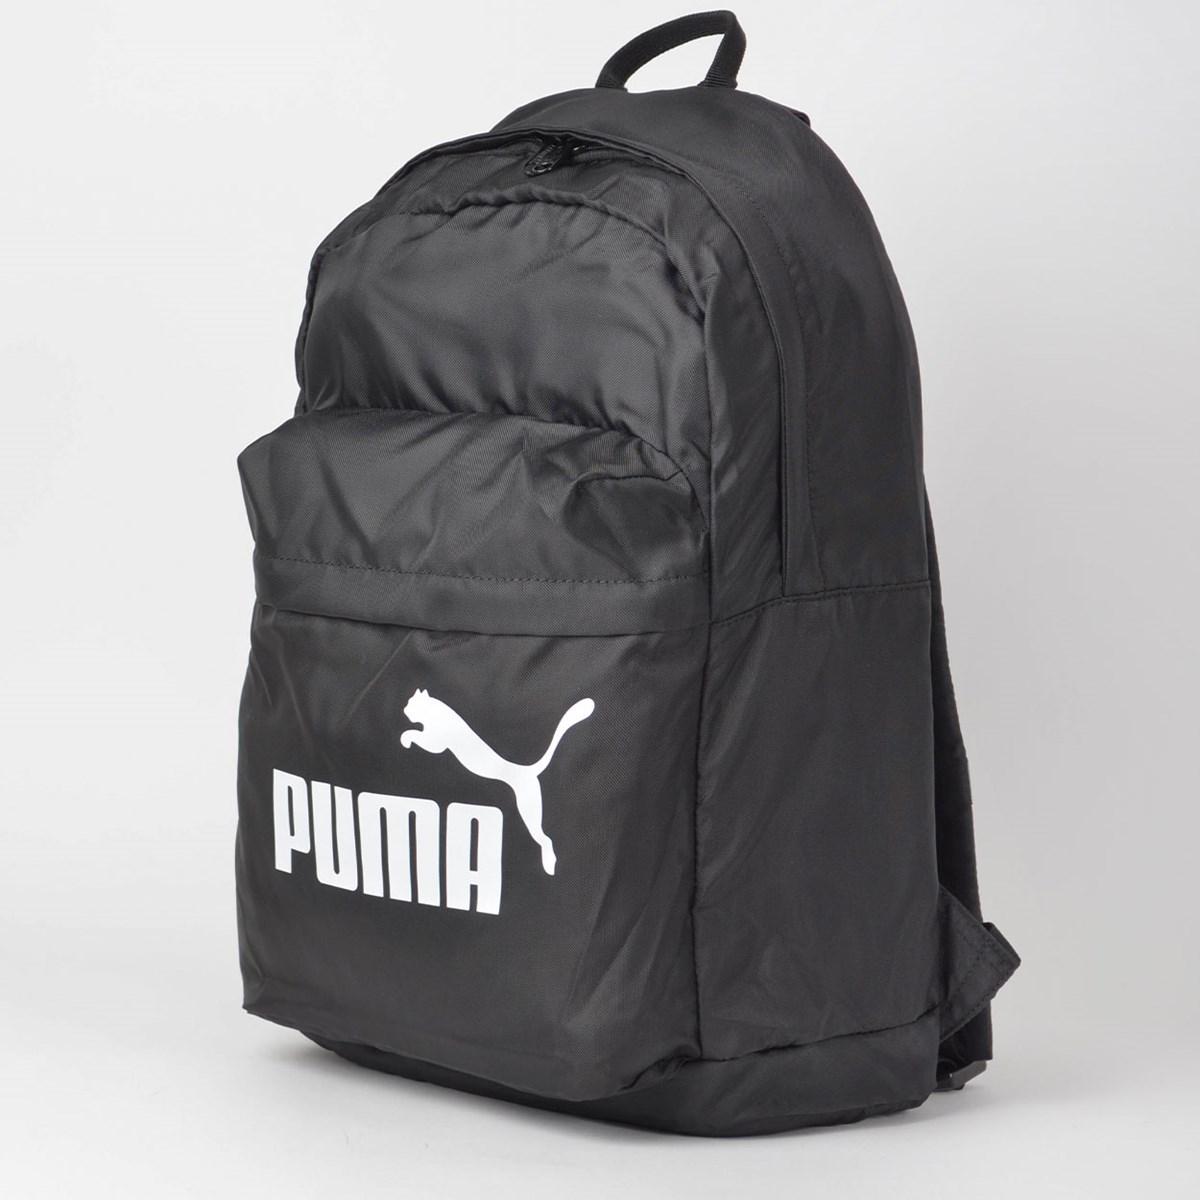 Mochila Puma Classic Backpack Preto 7575201